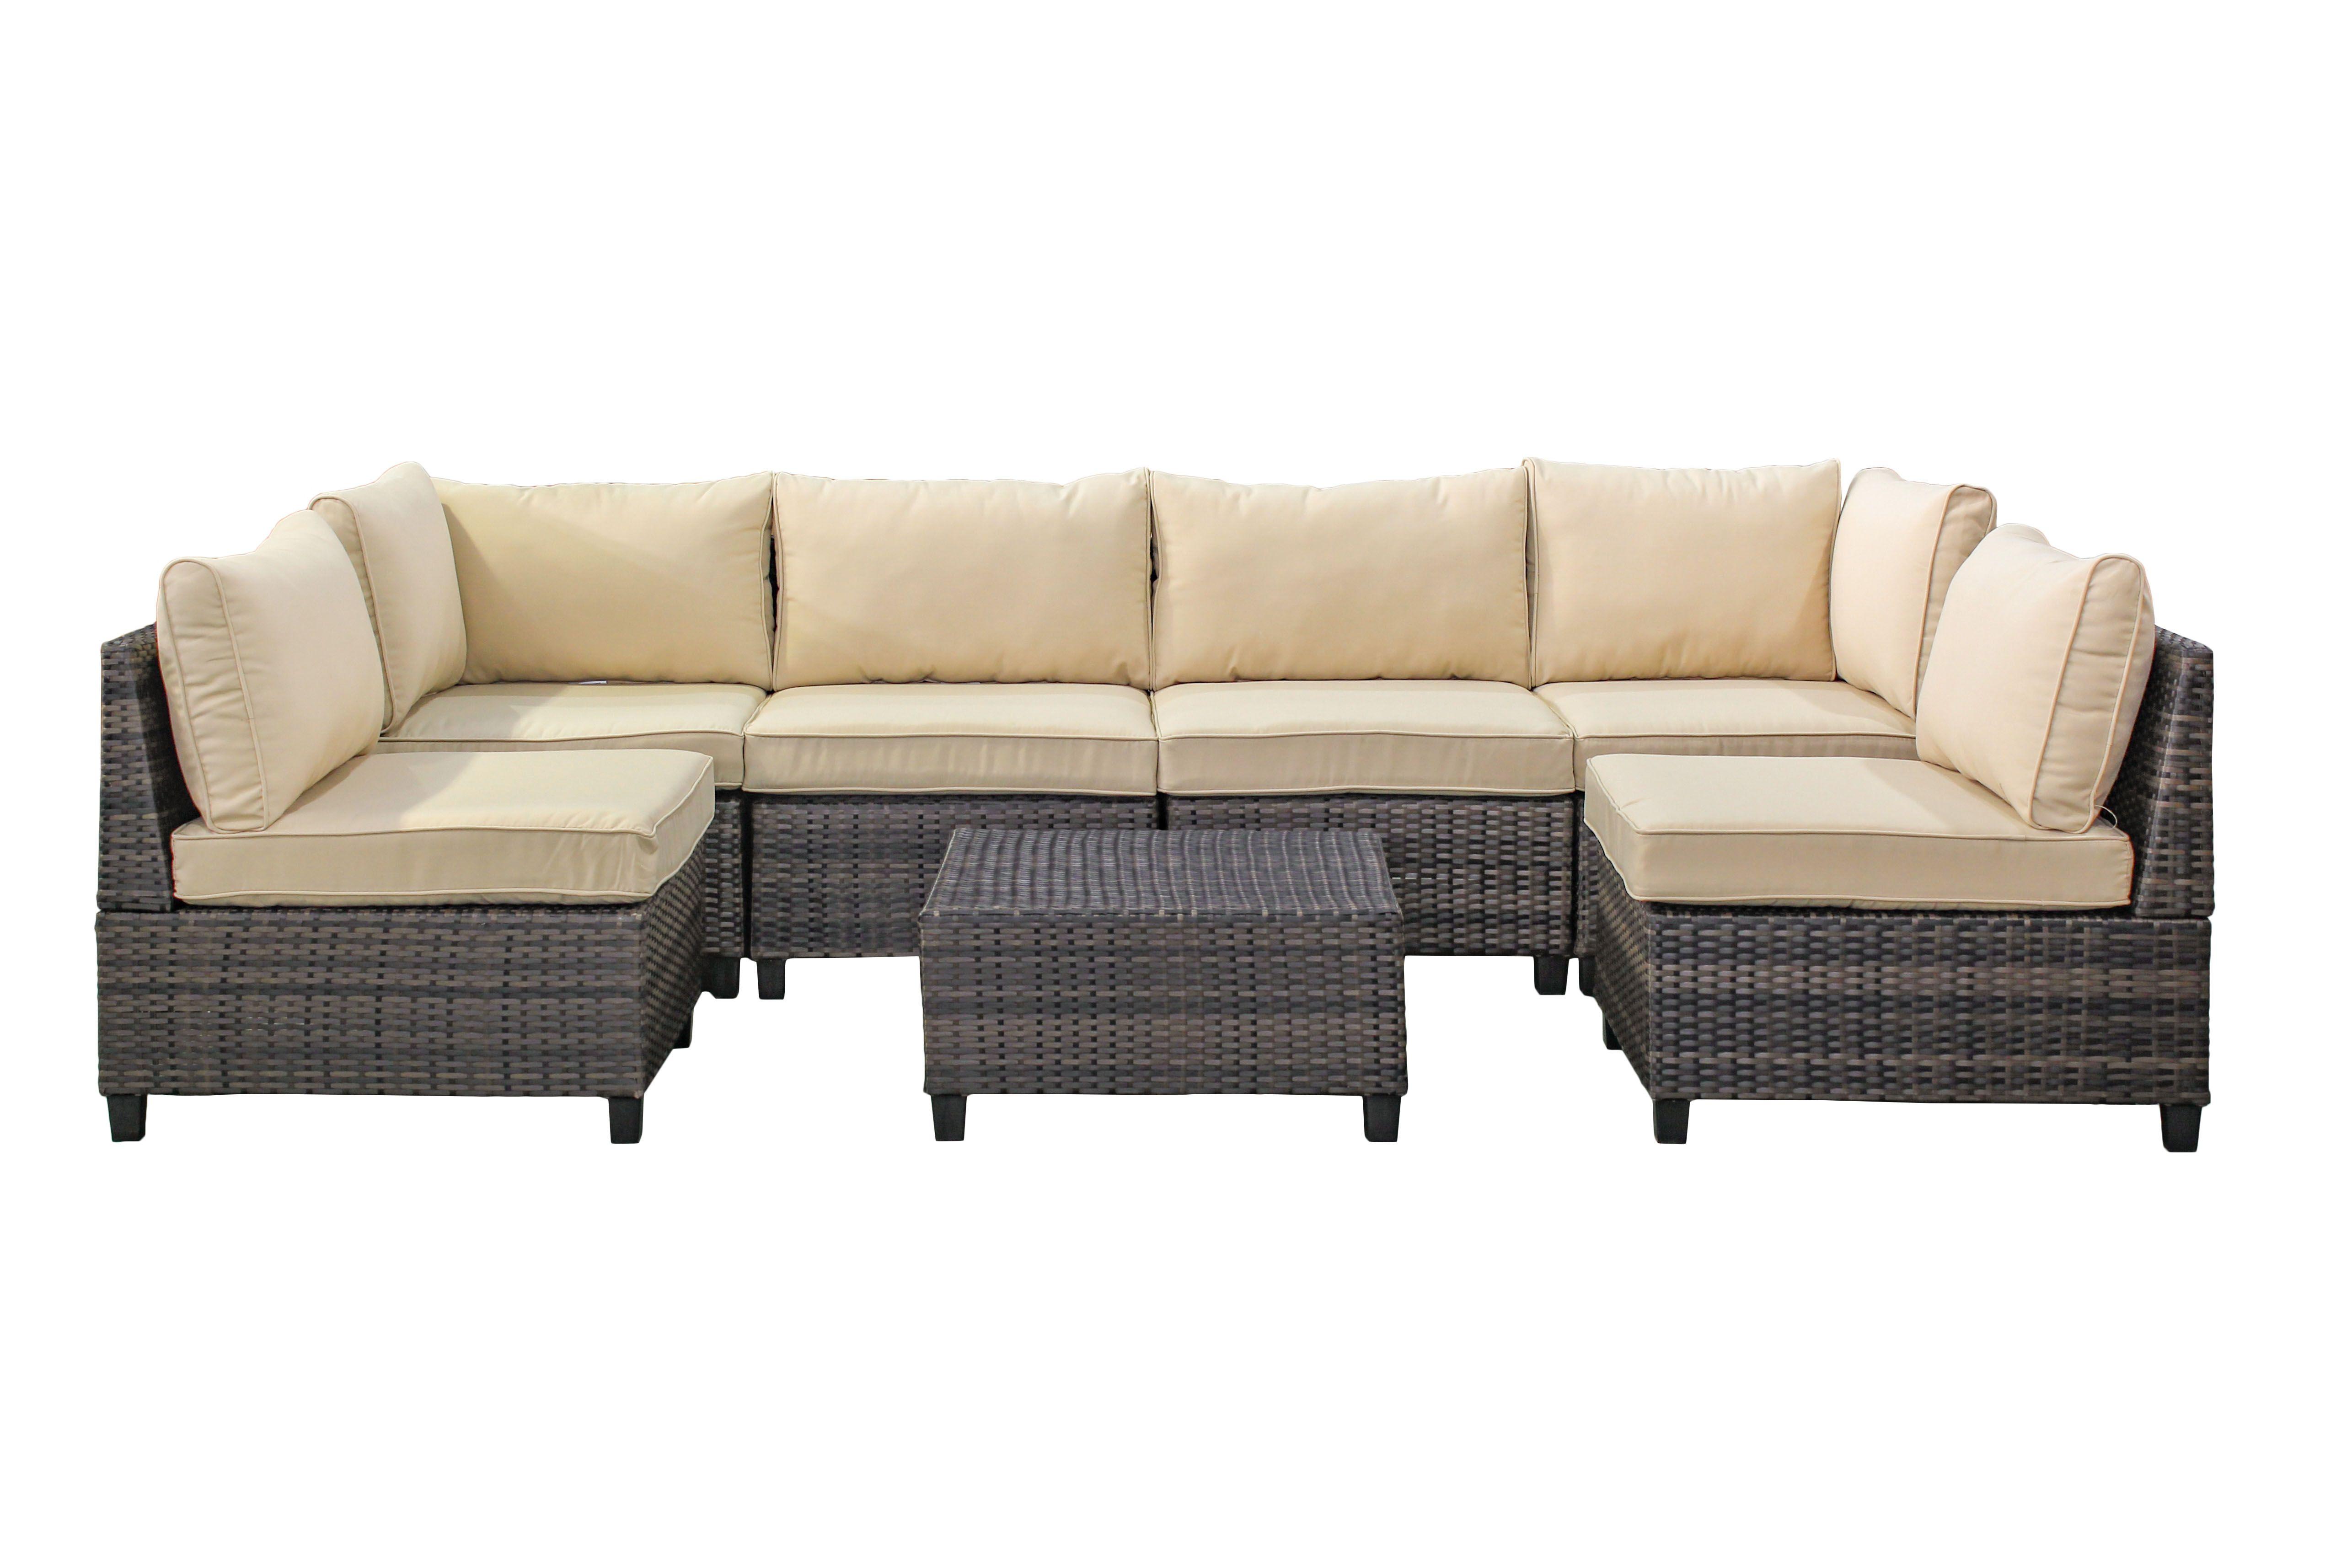 Living Express Tampa 7 Piece Outdoor Sofa Http Www Amazon Com Dp